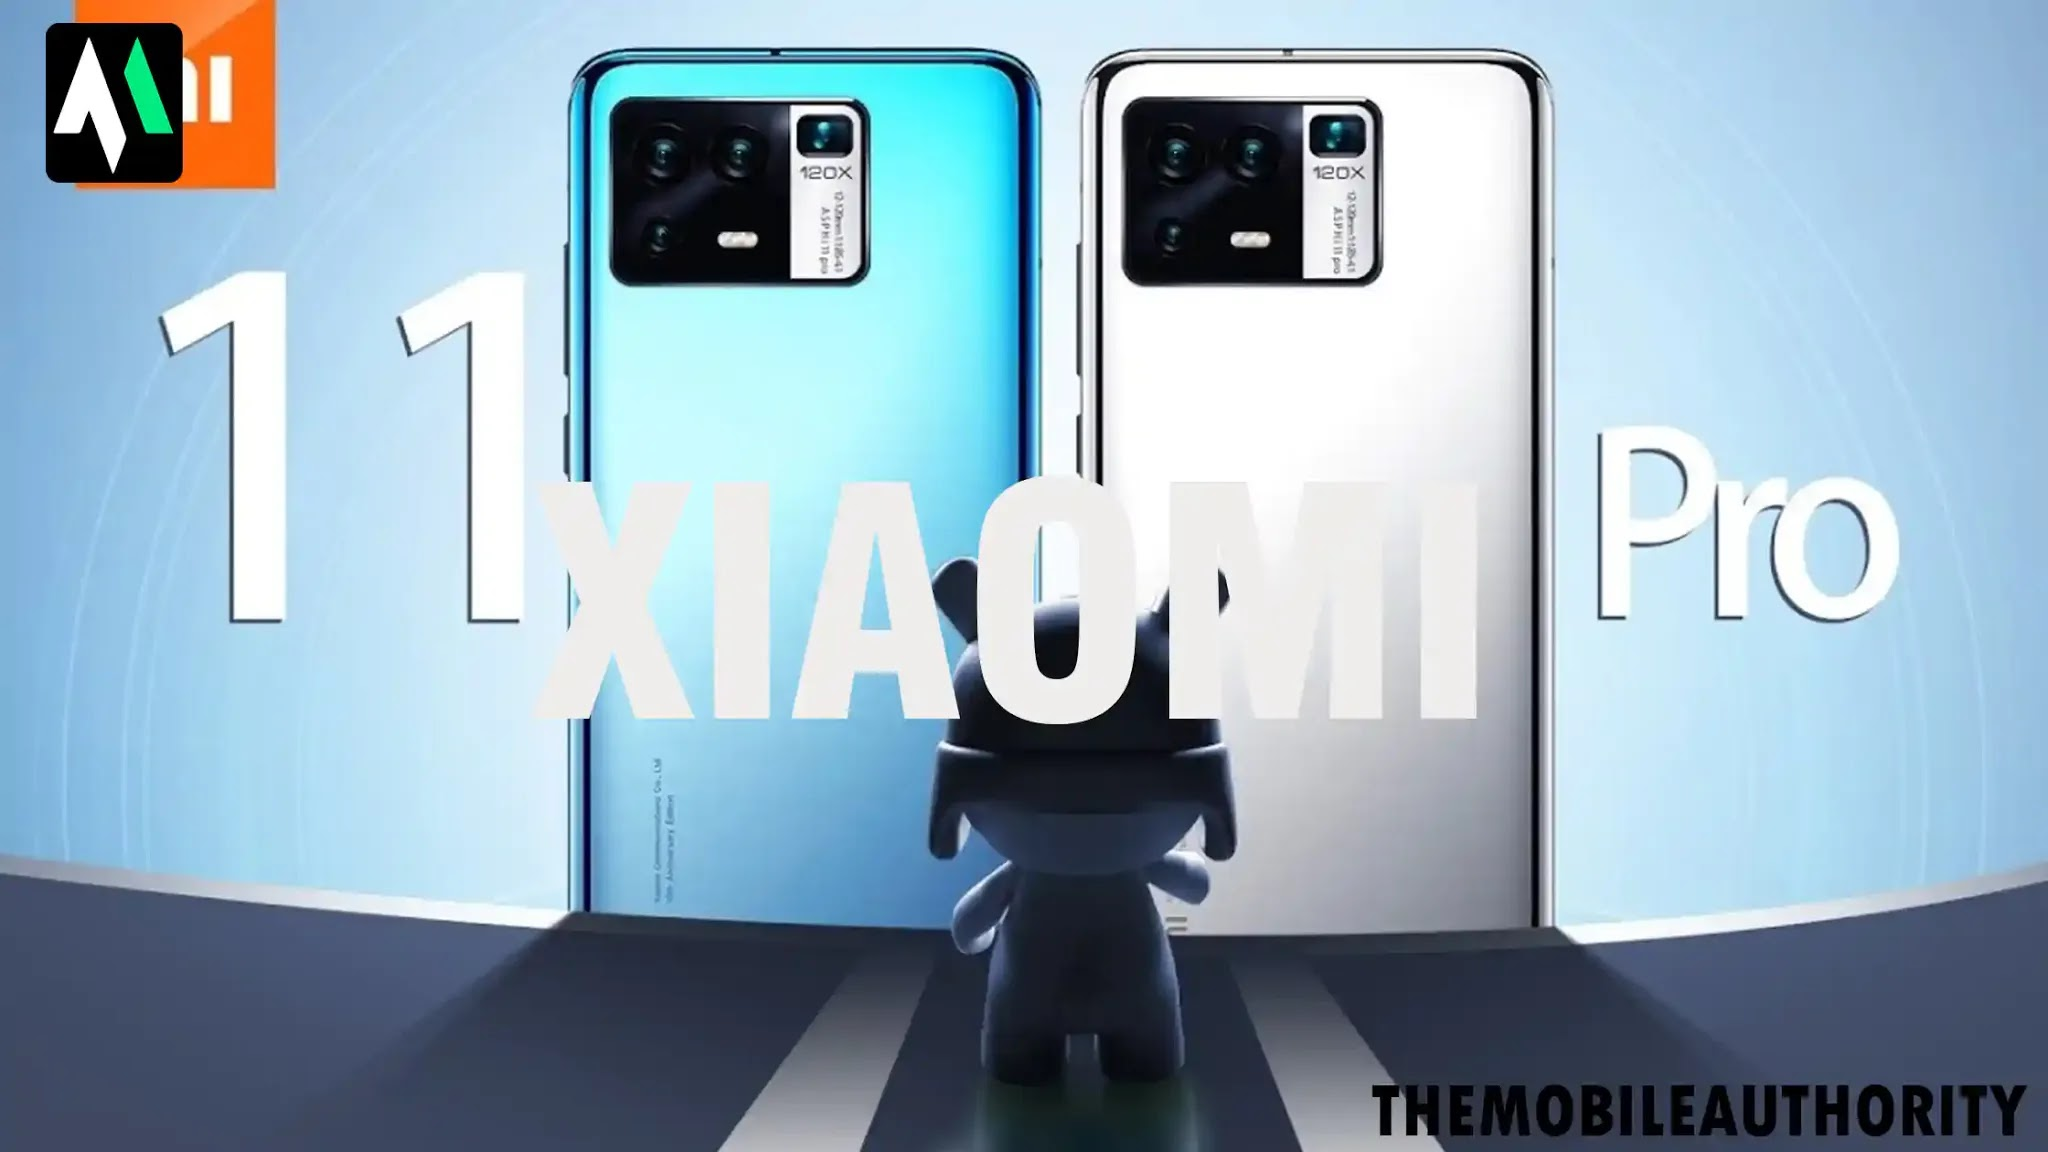 Xiaomi Mi 11 Pro to sport a 5,000 mAh battery